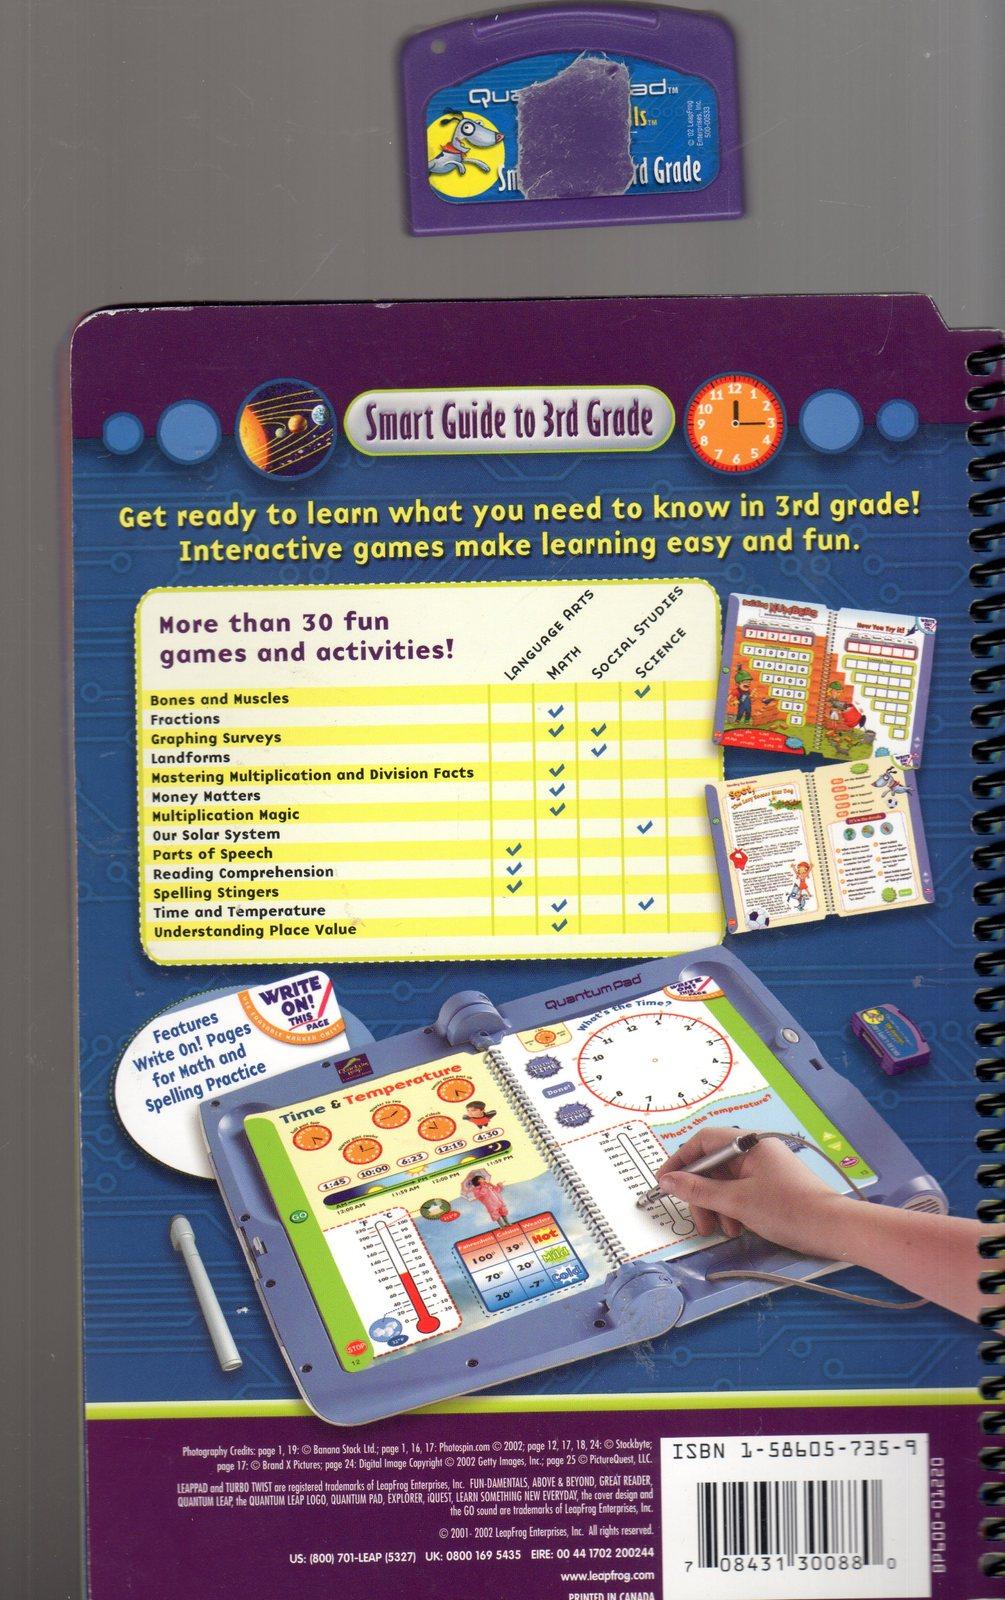 LeapFrog Quantum Pad - Smart Guide to 3rd Grade